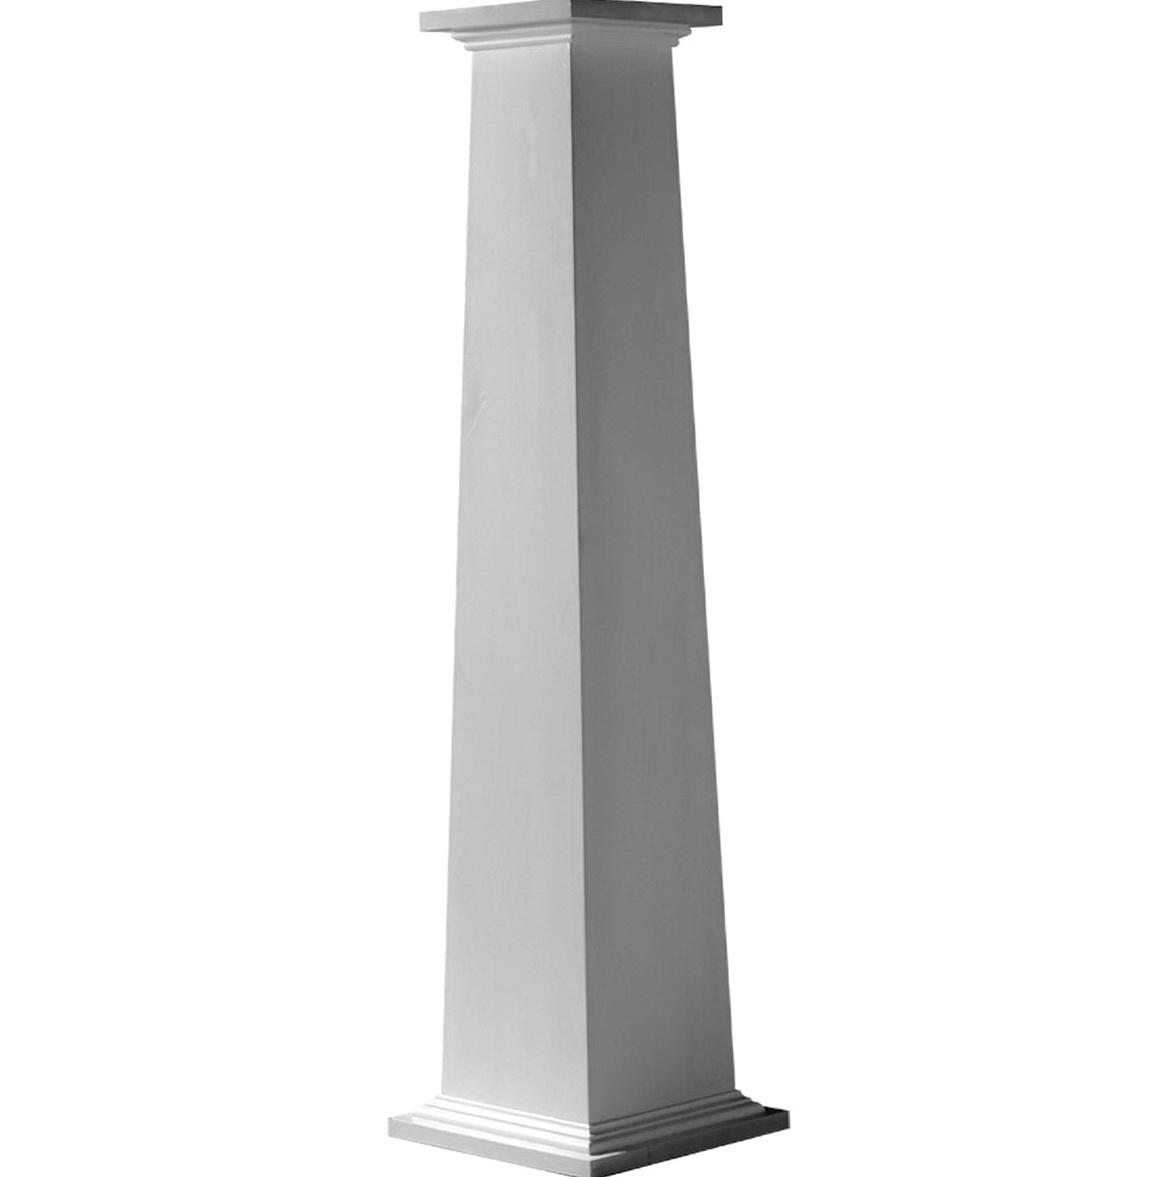 Porch Columns Home Depot Prices